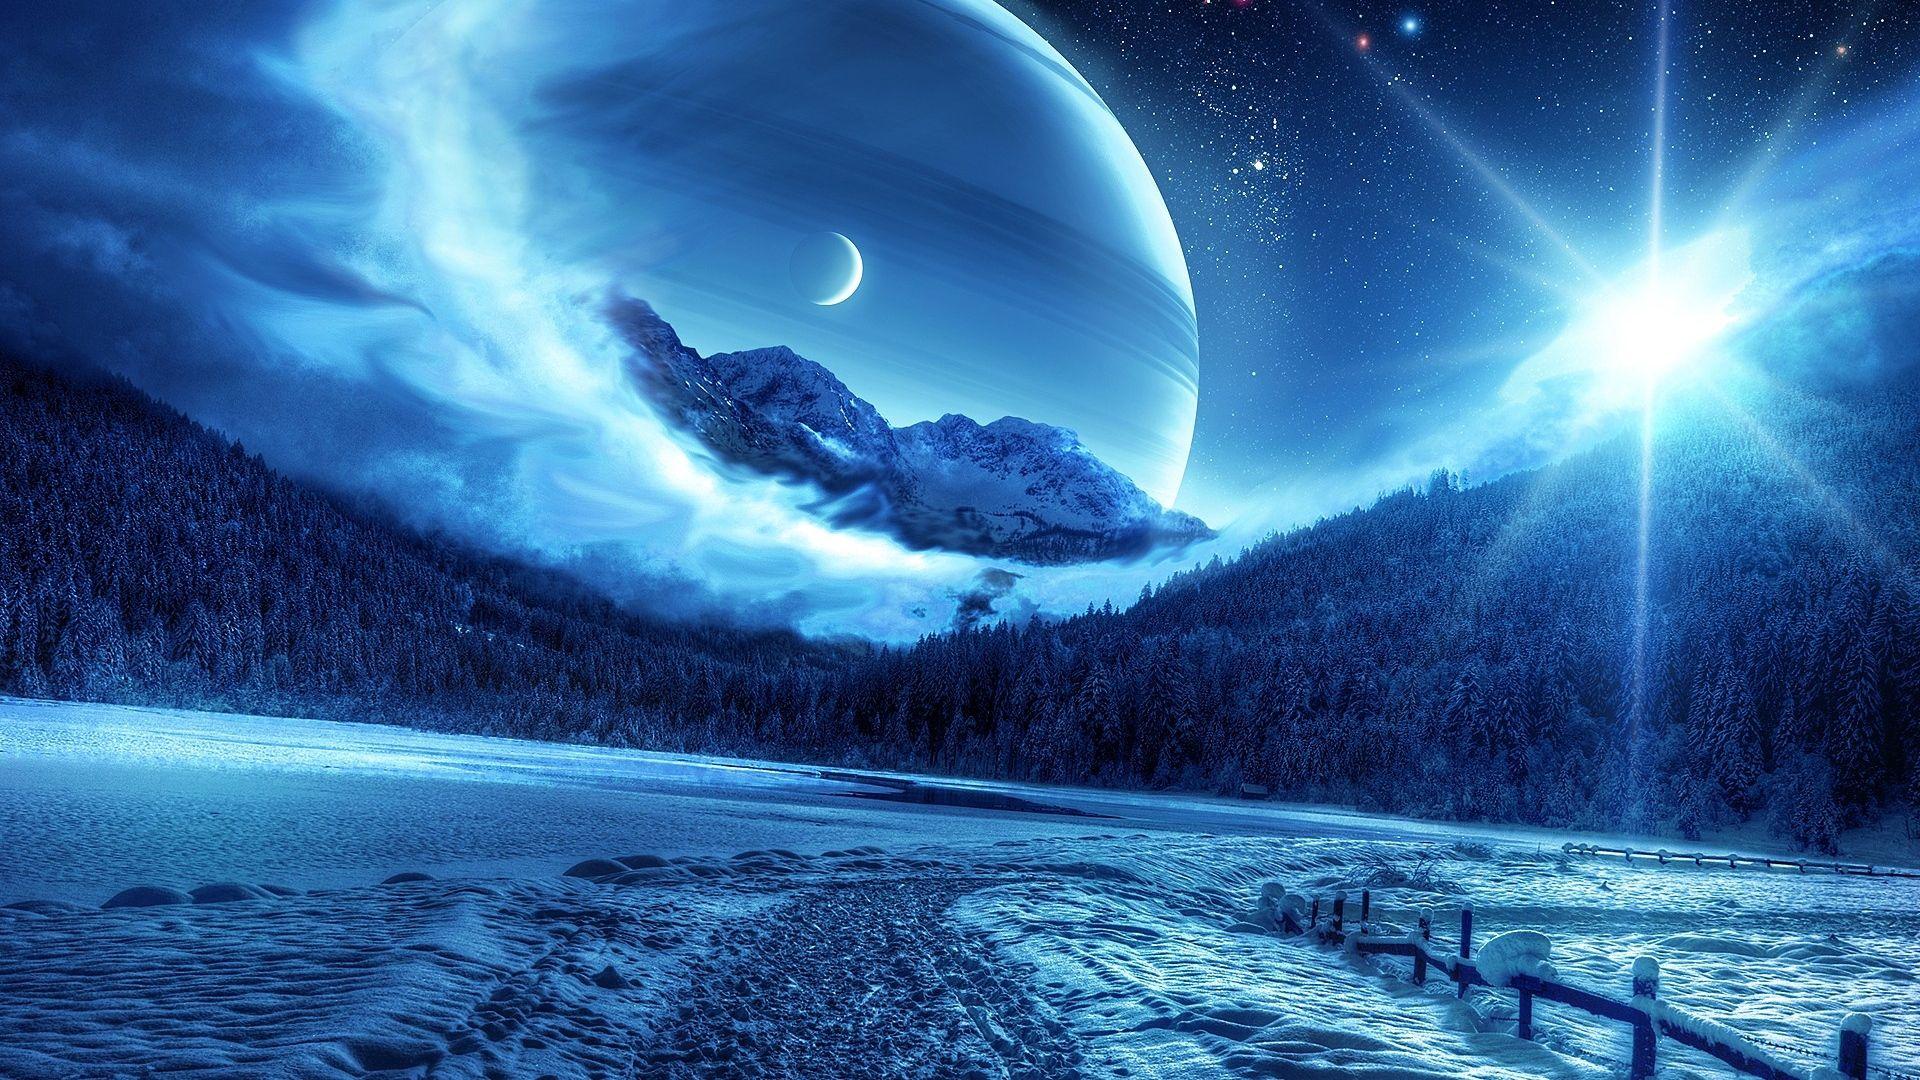 Beautiful Cosmic Landscapes